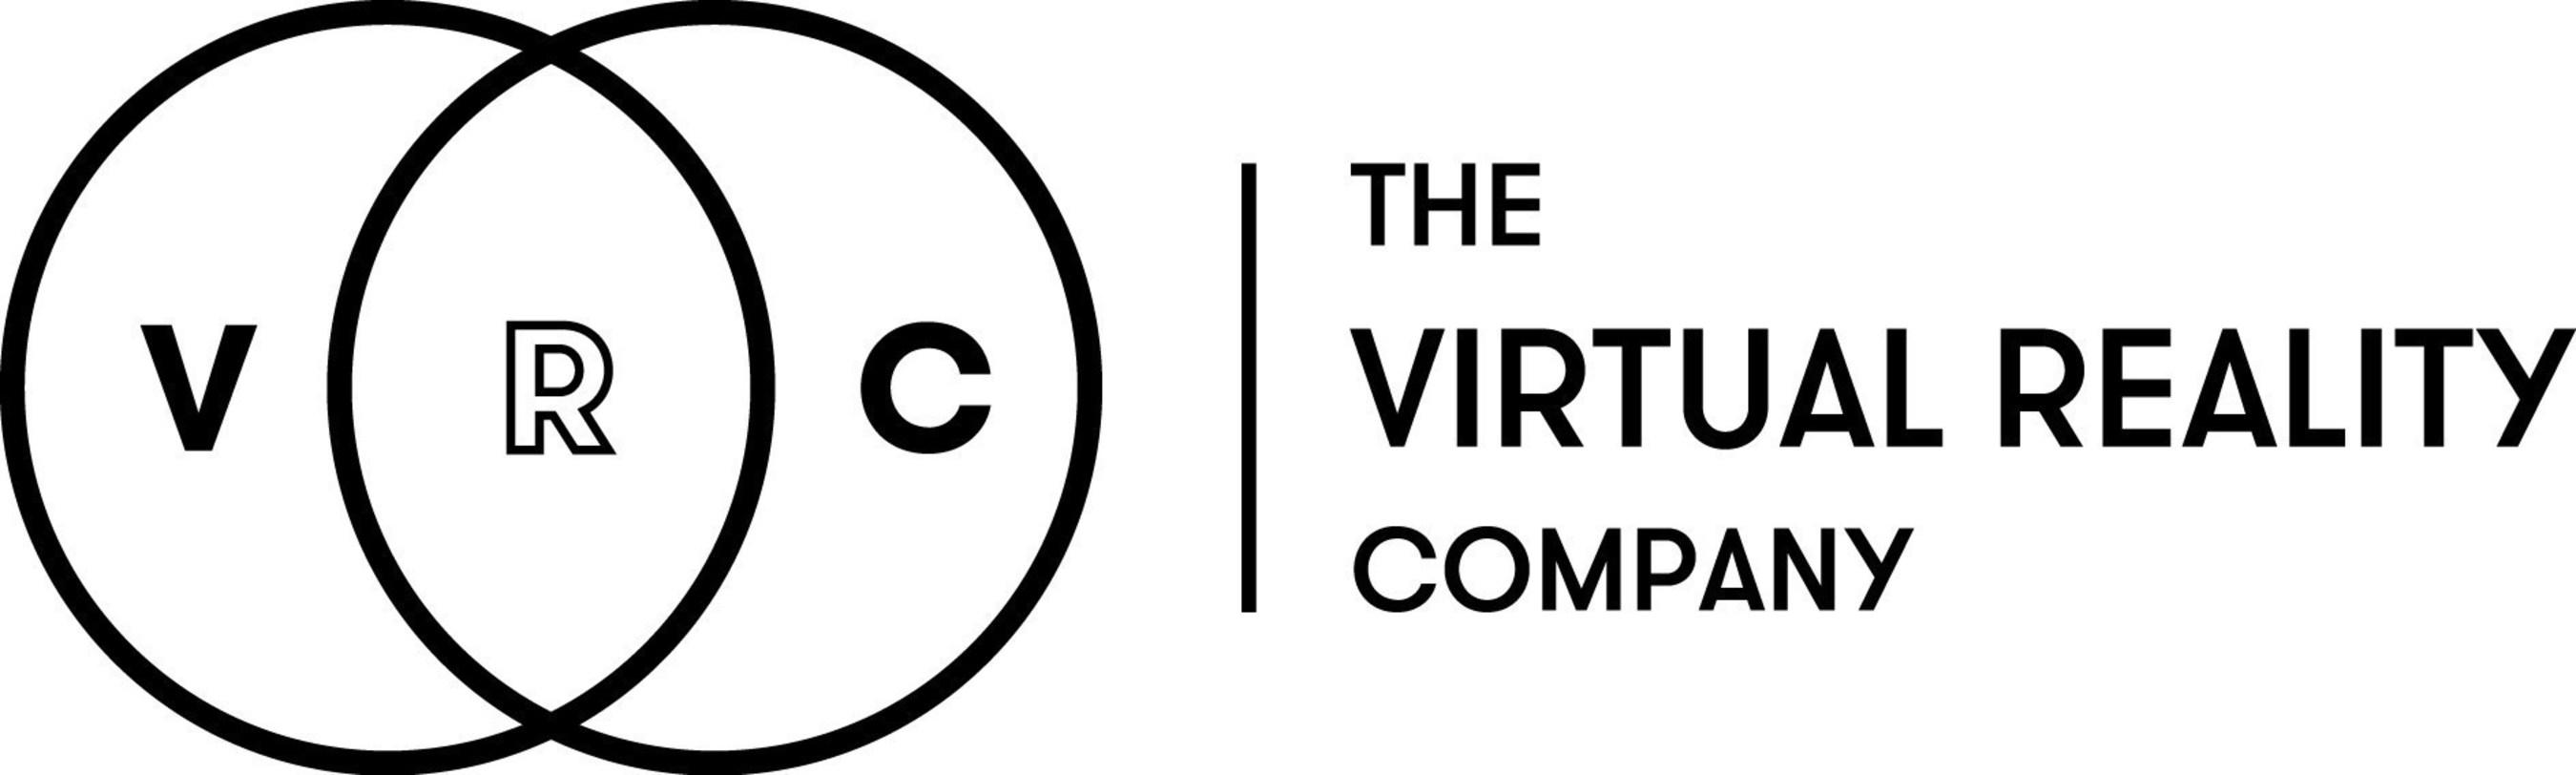 Hollywood Insiders Raise $23 Million for VR Content Studio